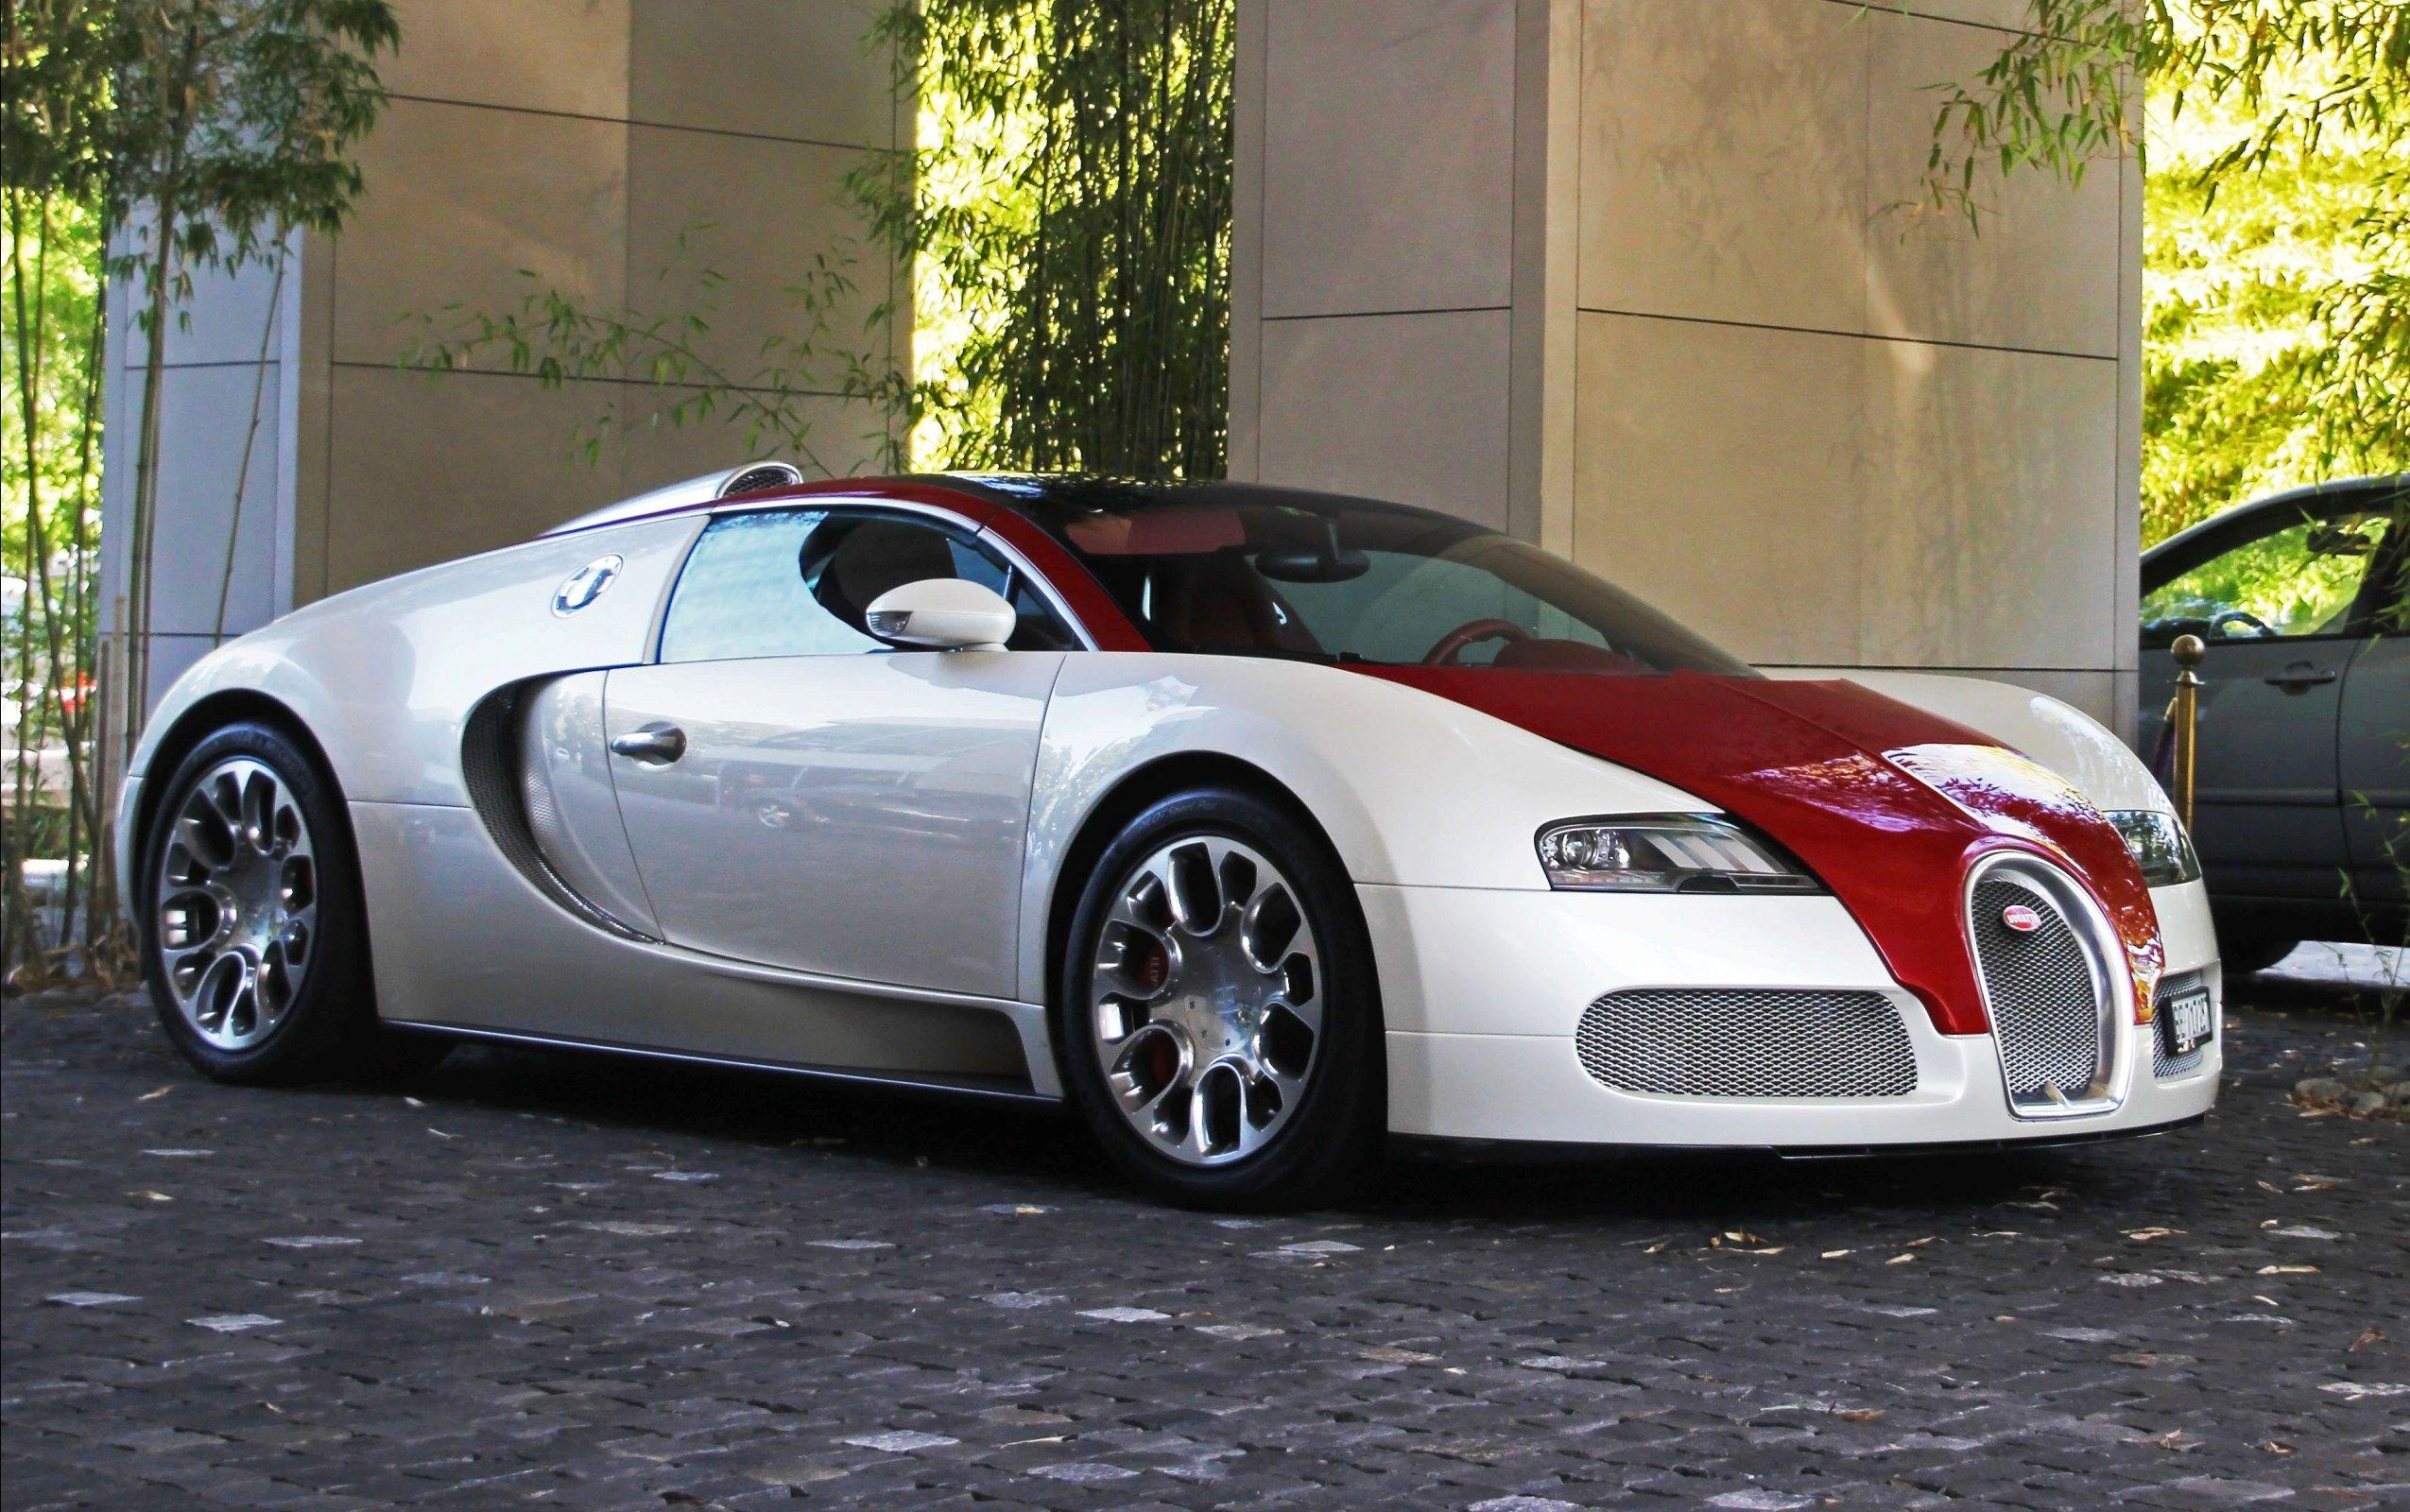 This Is Bugatti Veyron Wallpaper Bugatti Bugatti Veyron Bugatti Cars